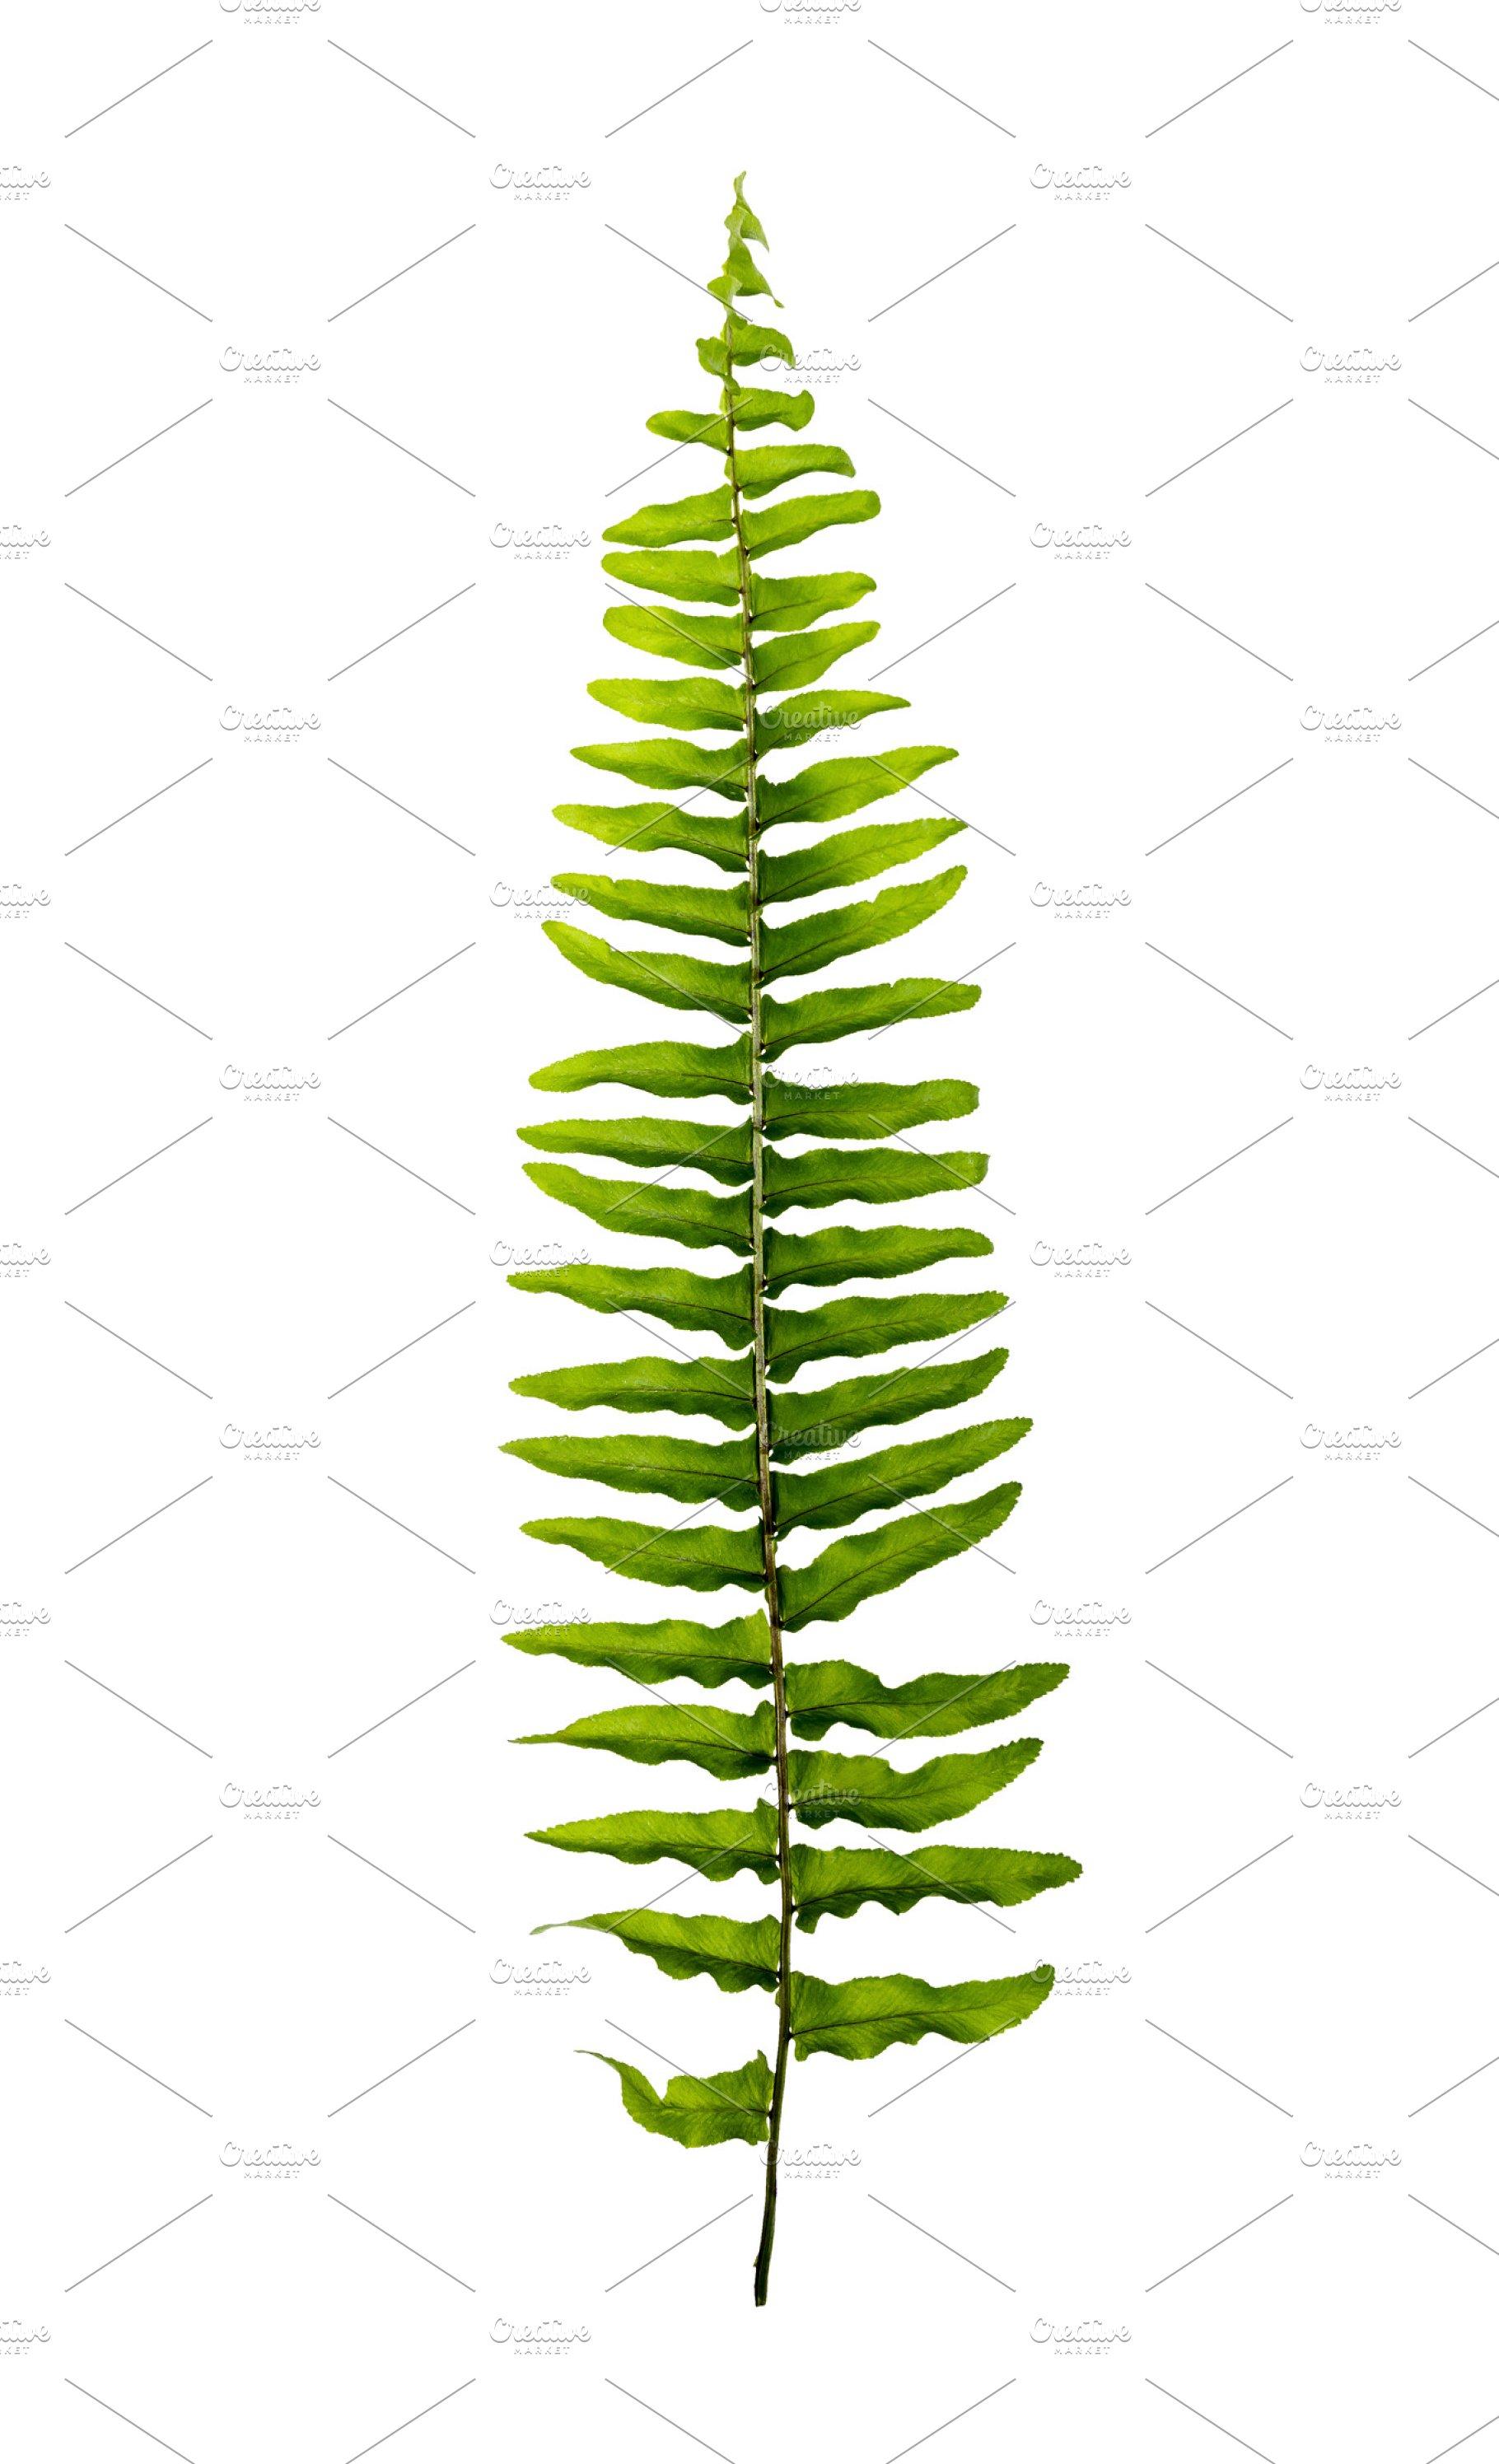 Boston Fern Leaves High Quality Nature Stock Photos Creative